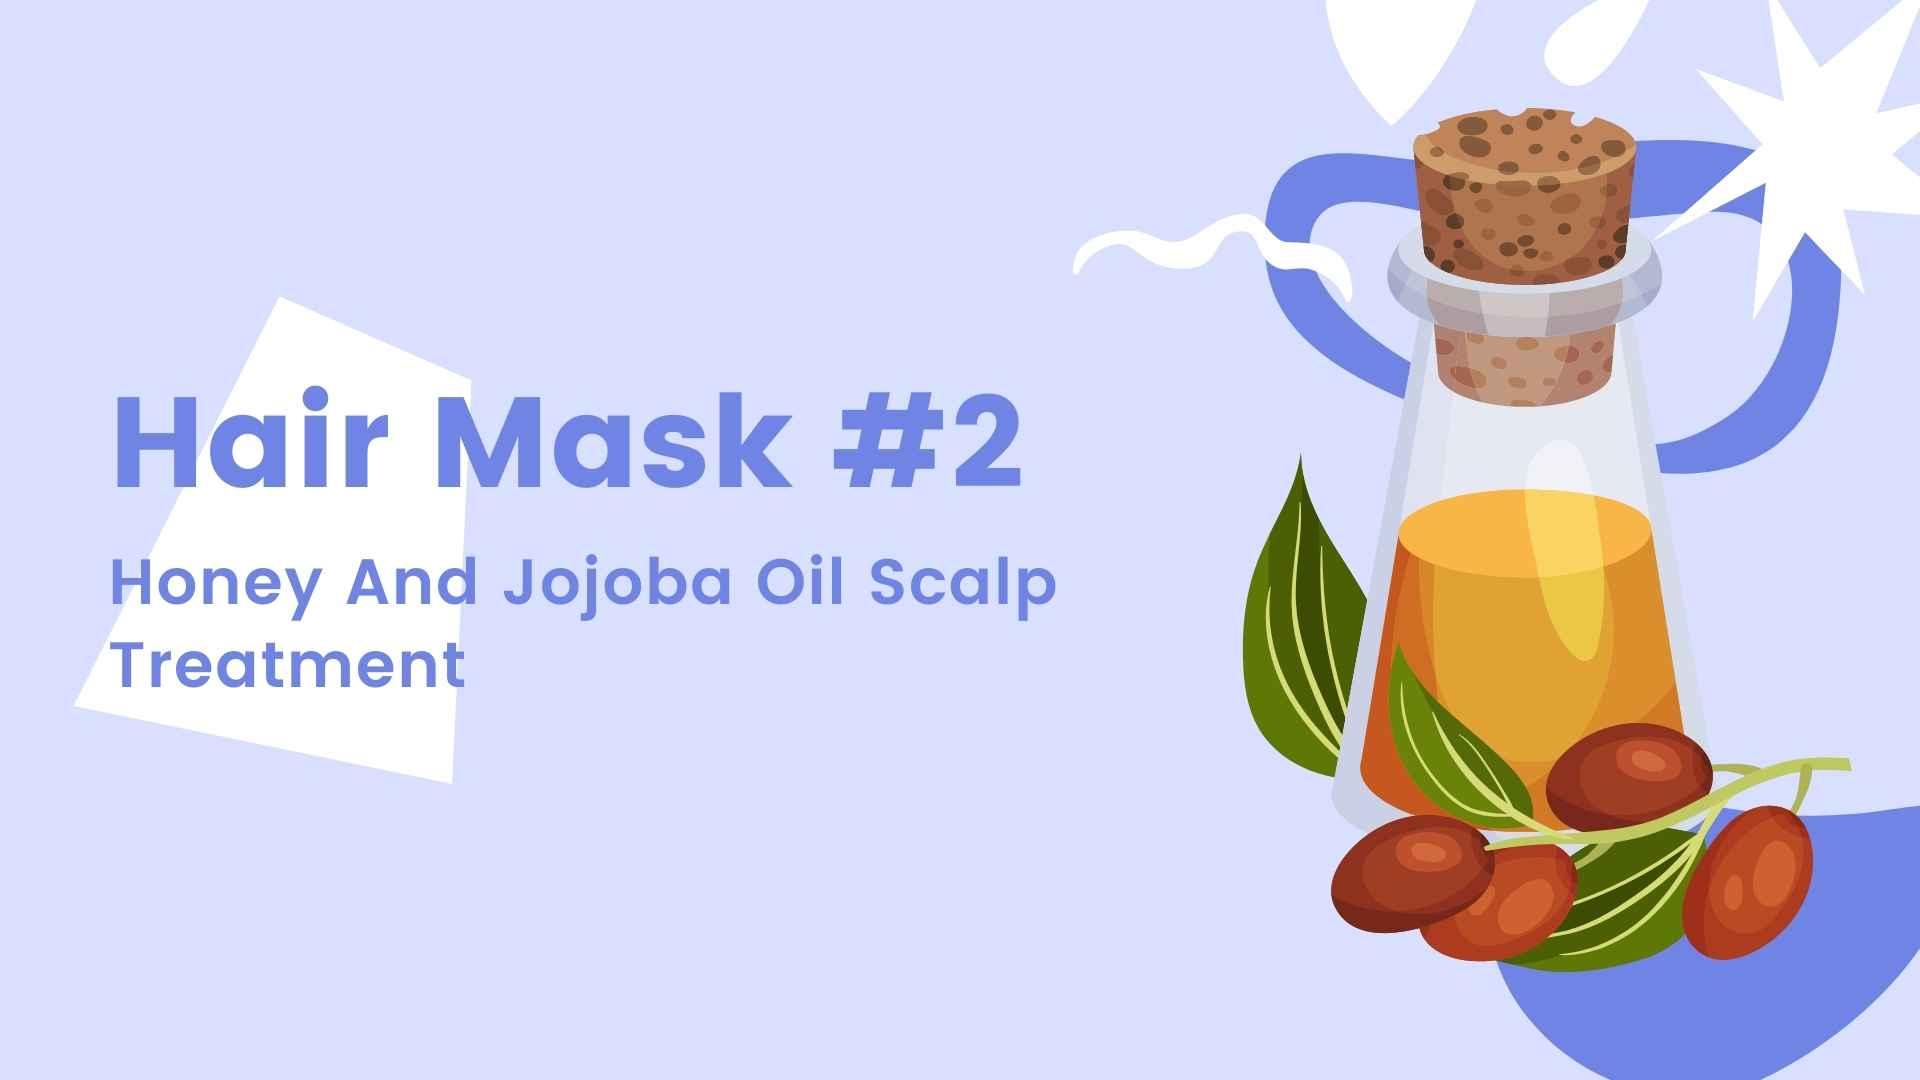 Hair Mask #2 Honey And Jojoba Oil Scalp Treatment